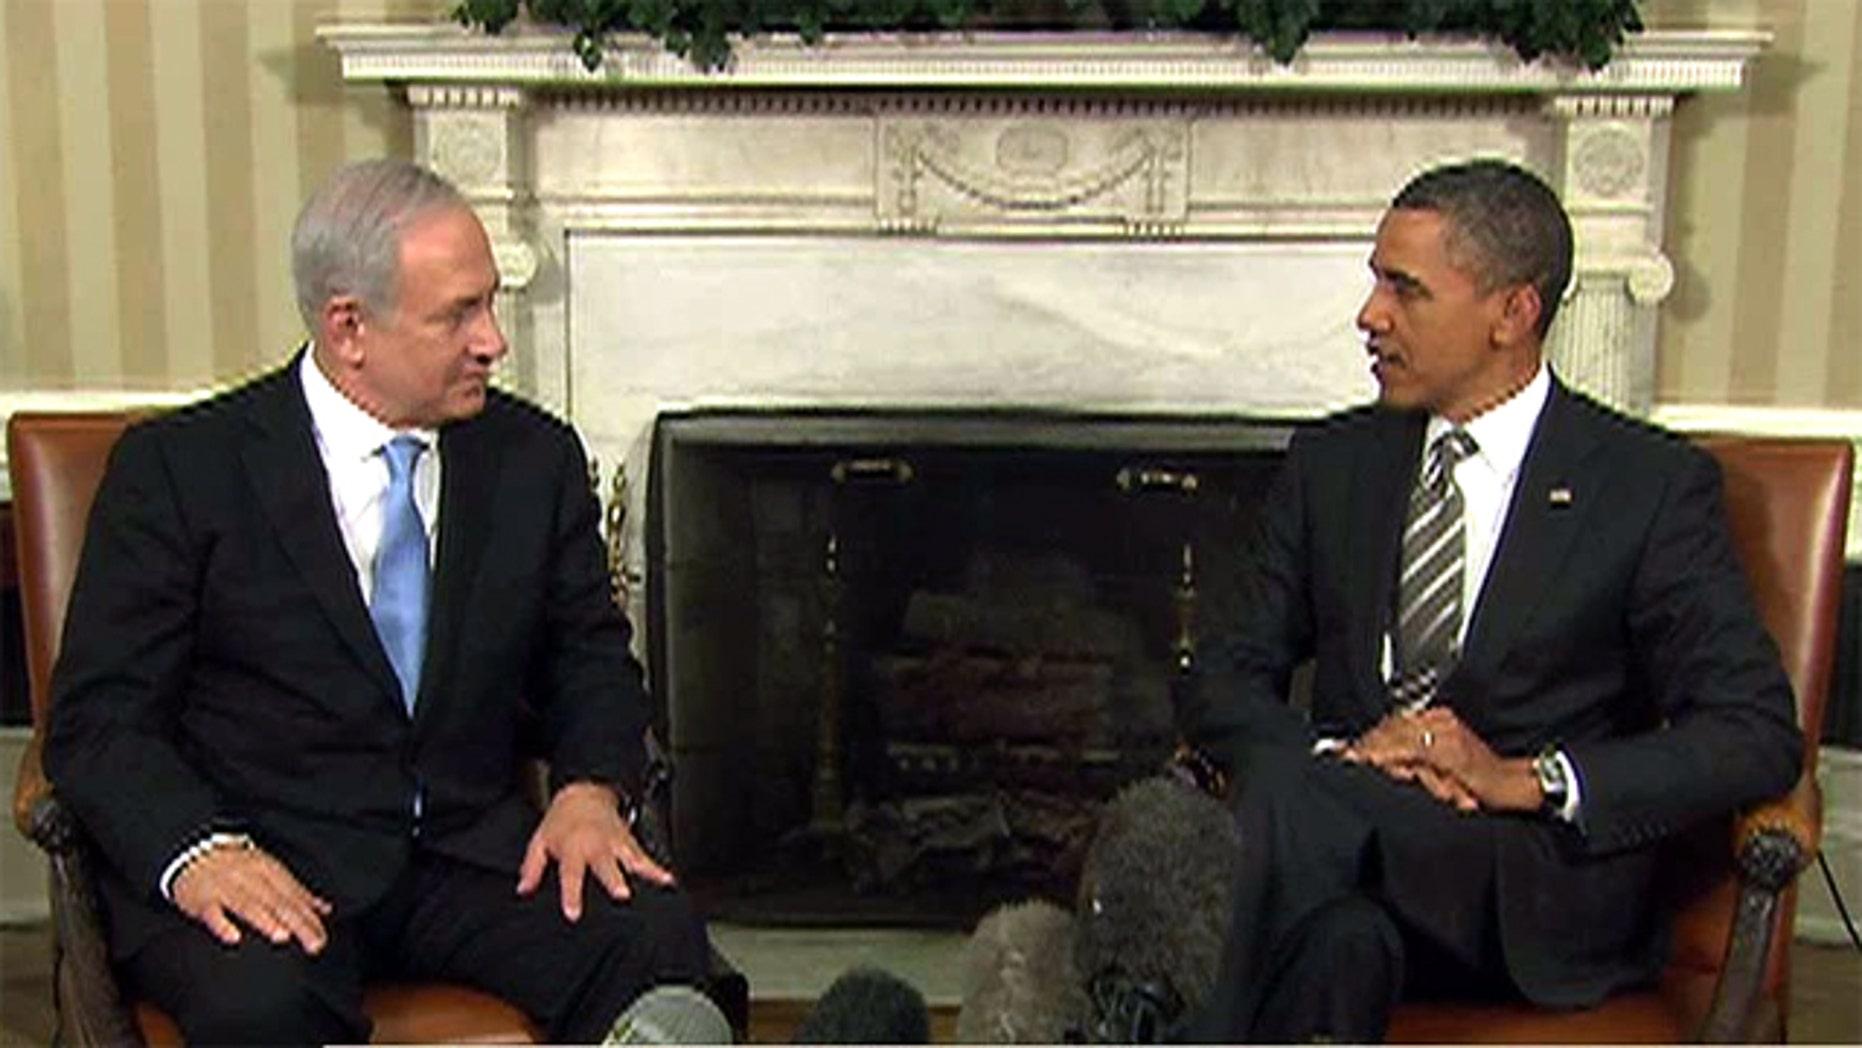 Friday: President Obama and Israeli Prime Minister Benjamin Netanyahu meet at the White House.